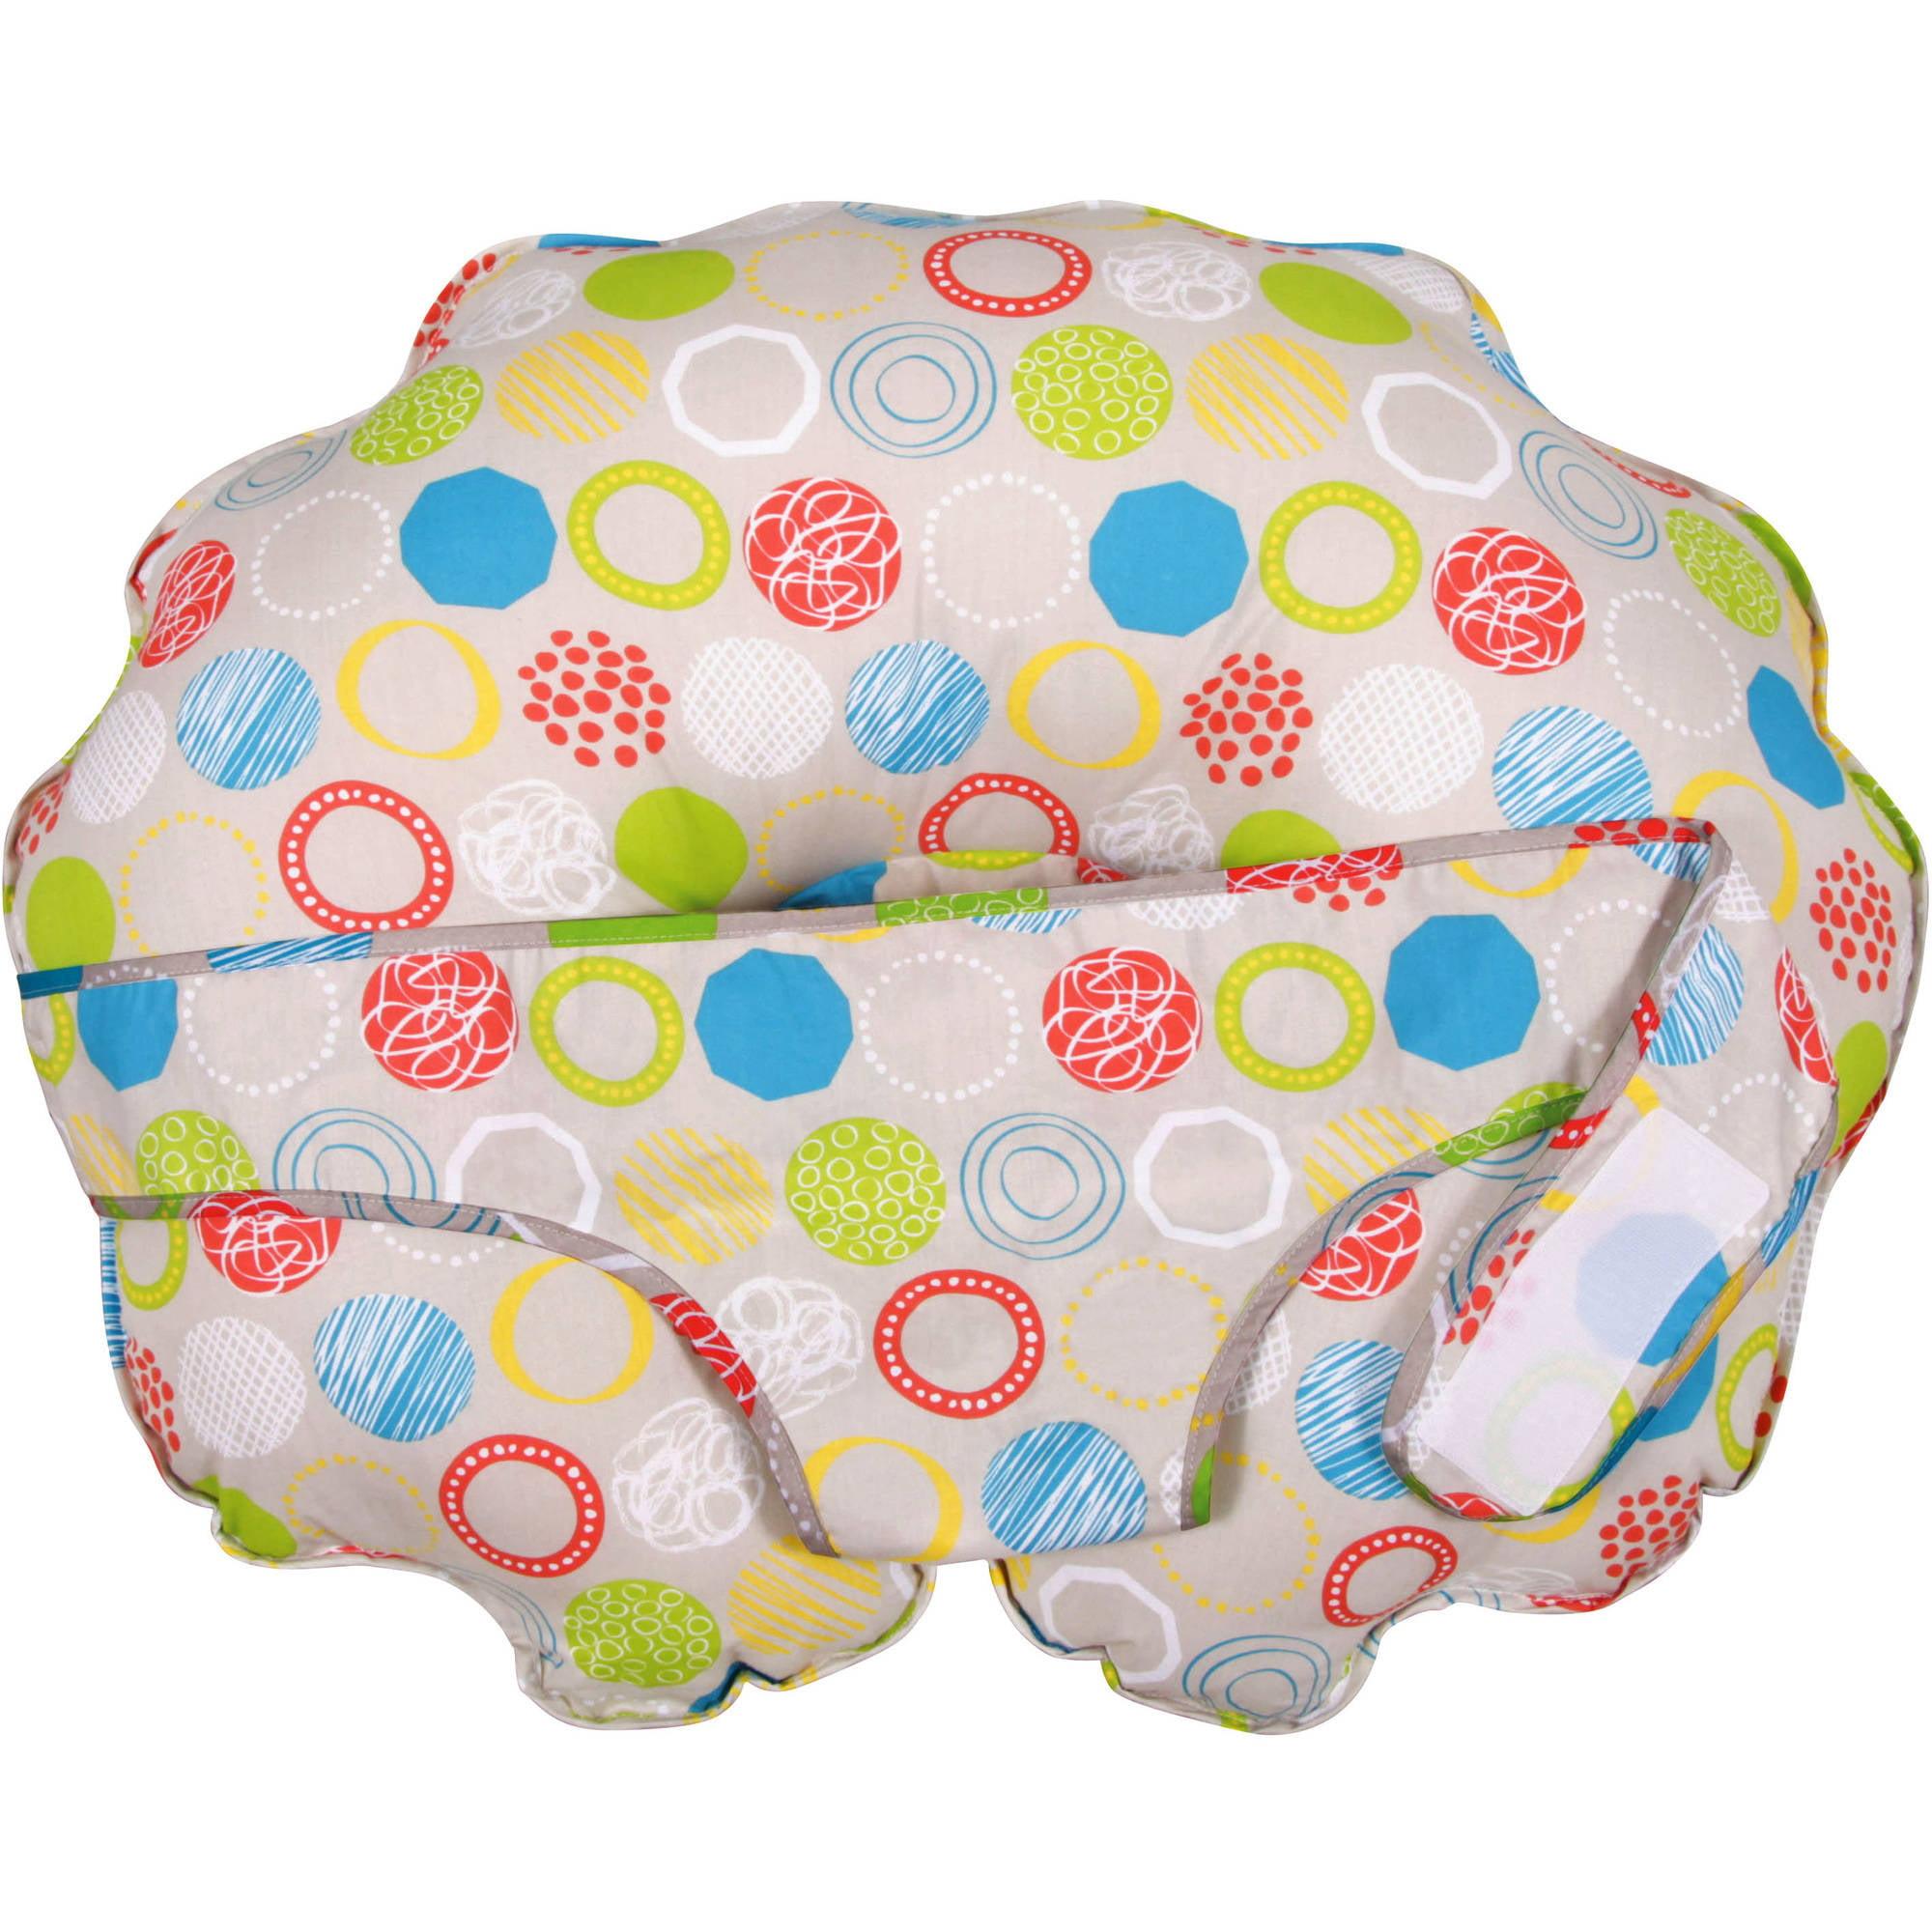 Leachco Cuddle-U Nursing Pillow and More, Whimsy Rounds - Walmart.com